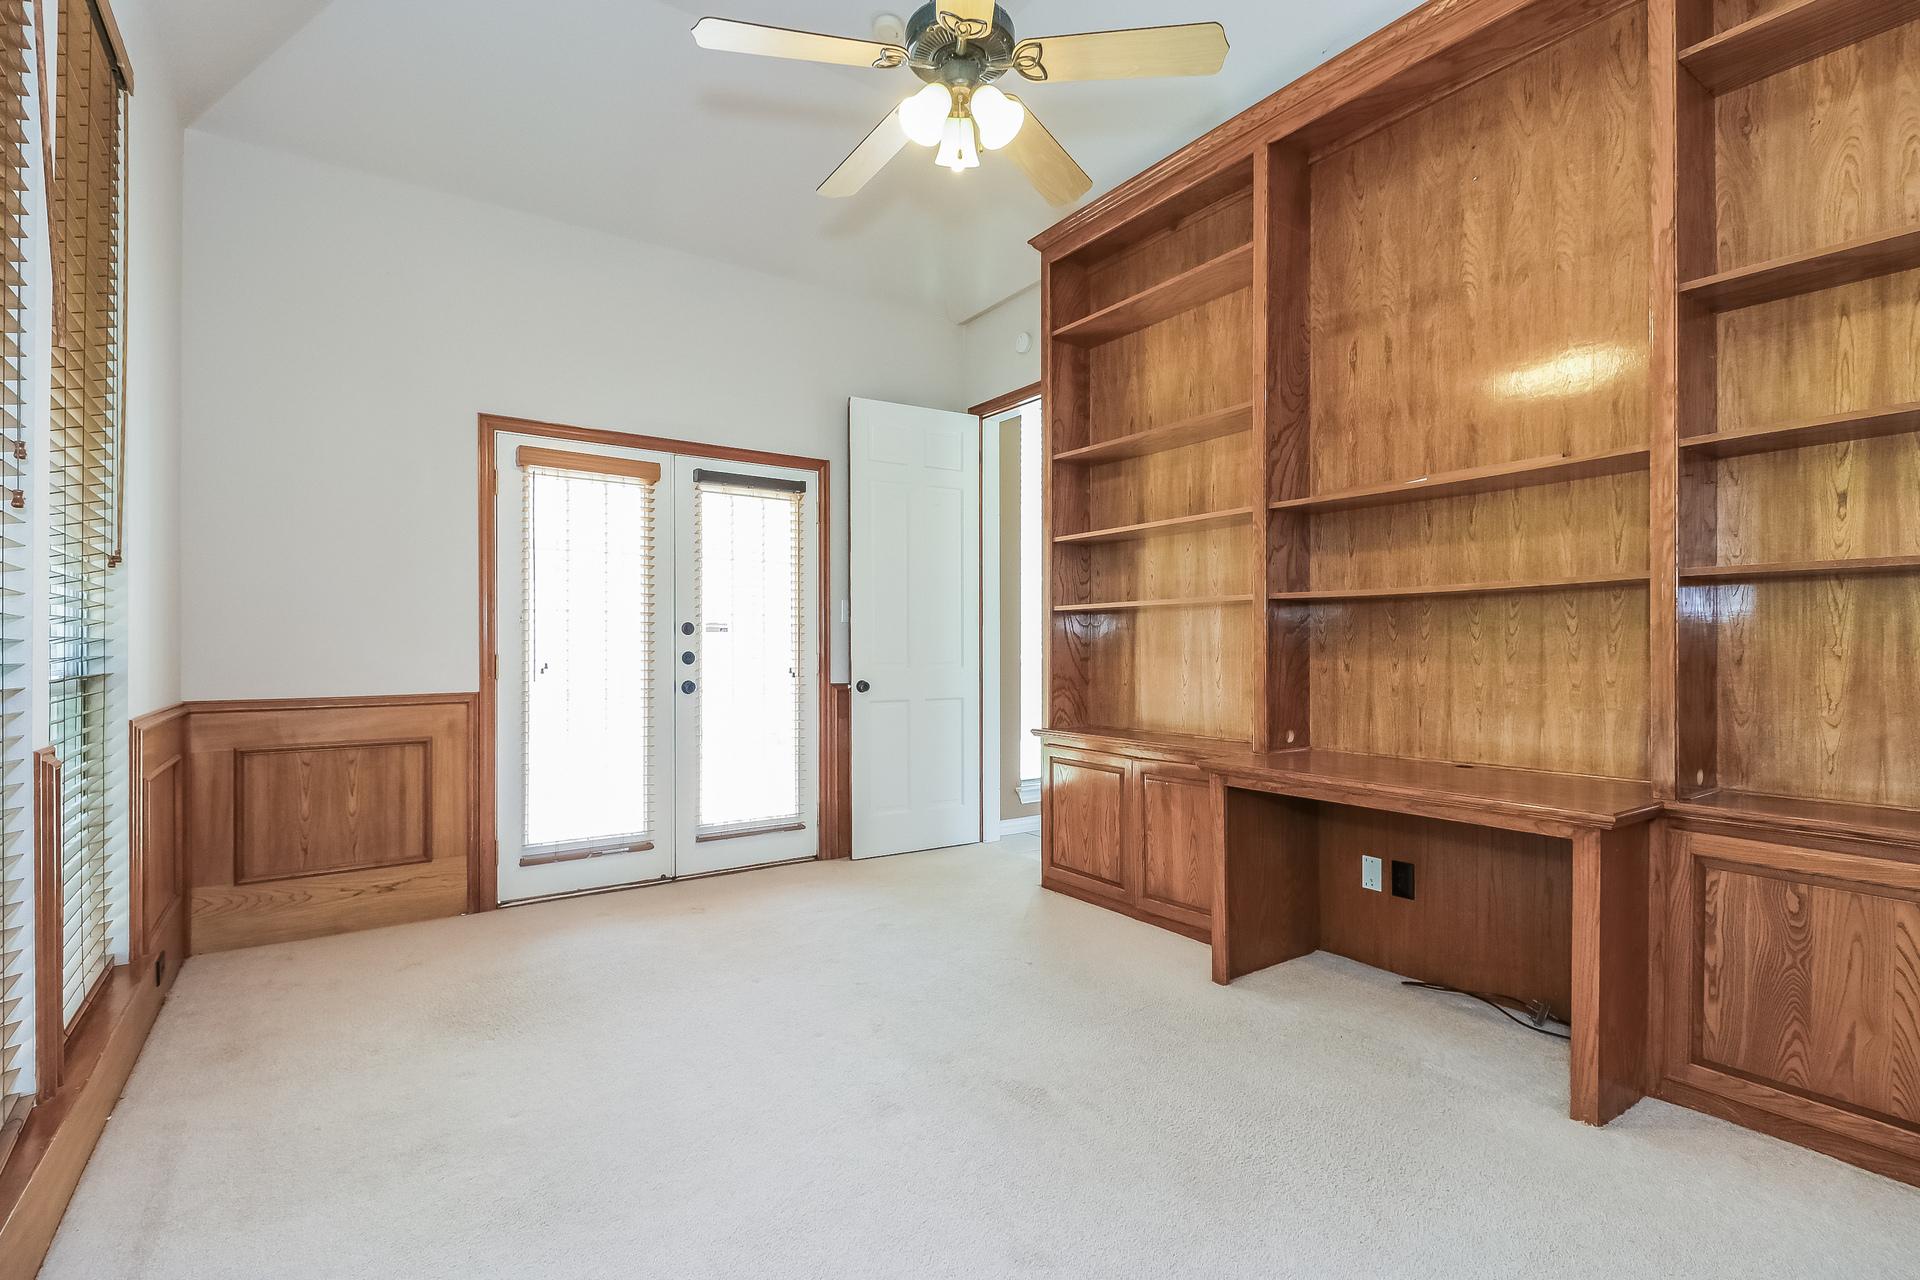 Photo of 807 Oakcrest Court, Southlake, TX, 76092